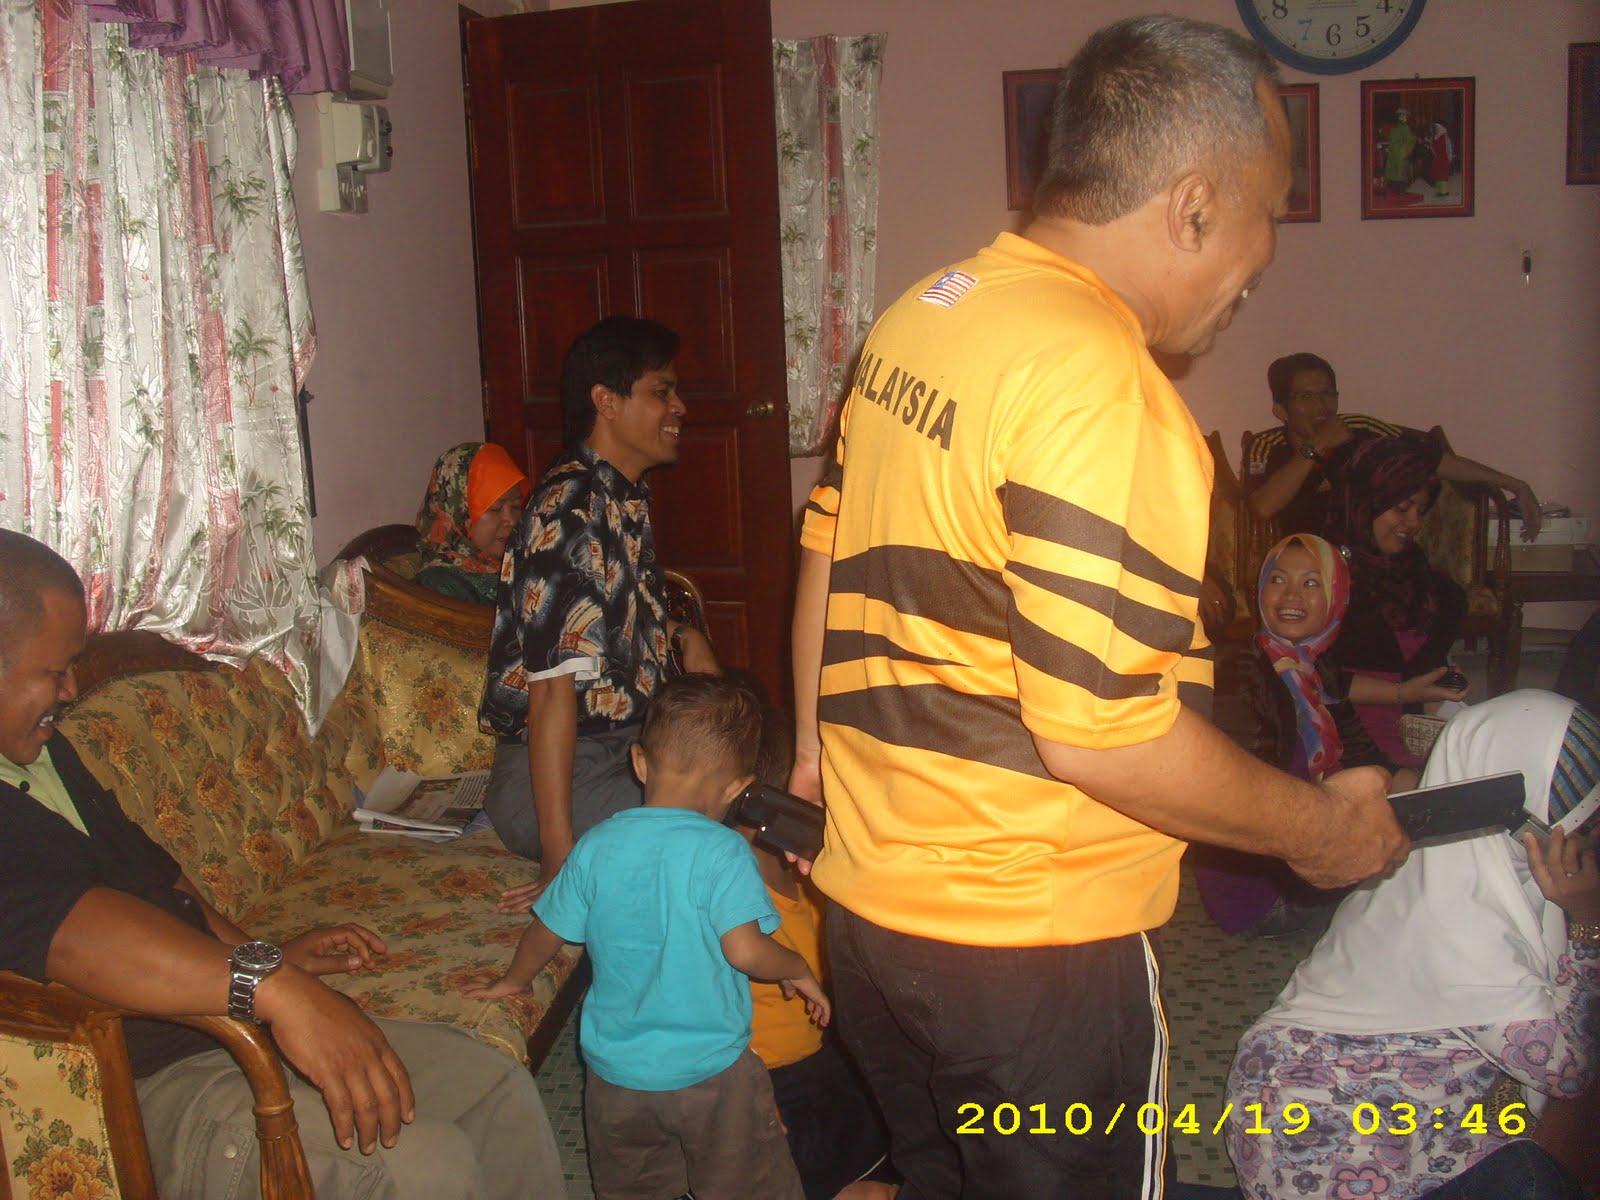 blog !n4 ni: July 2010